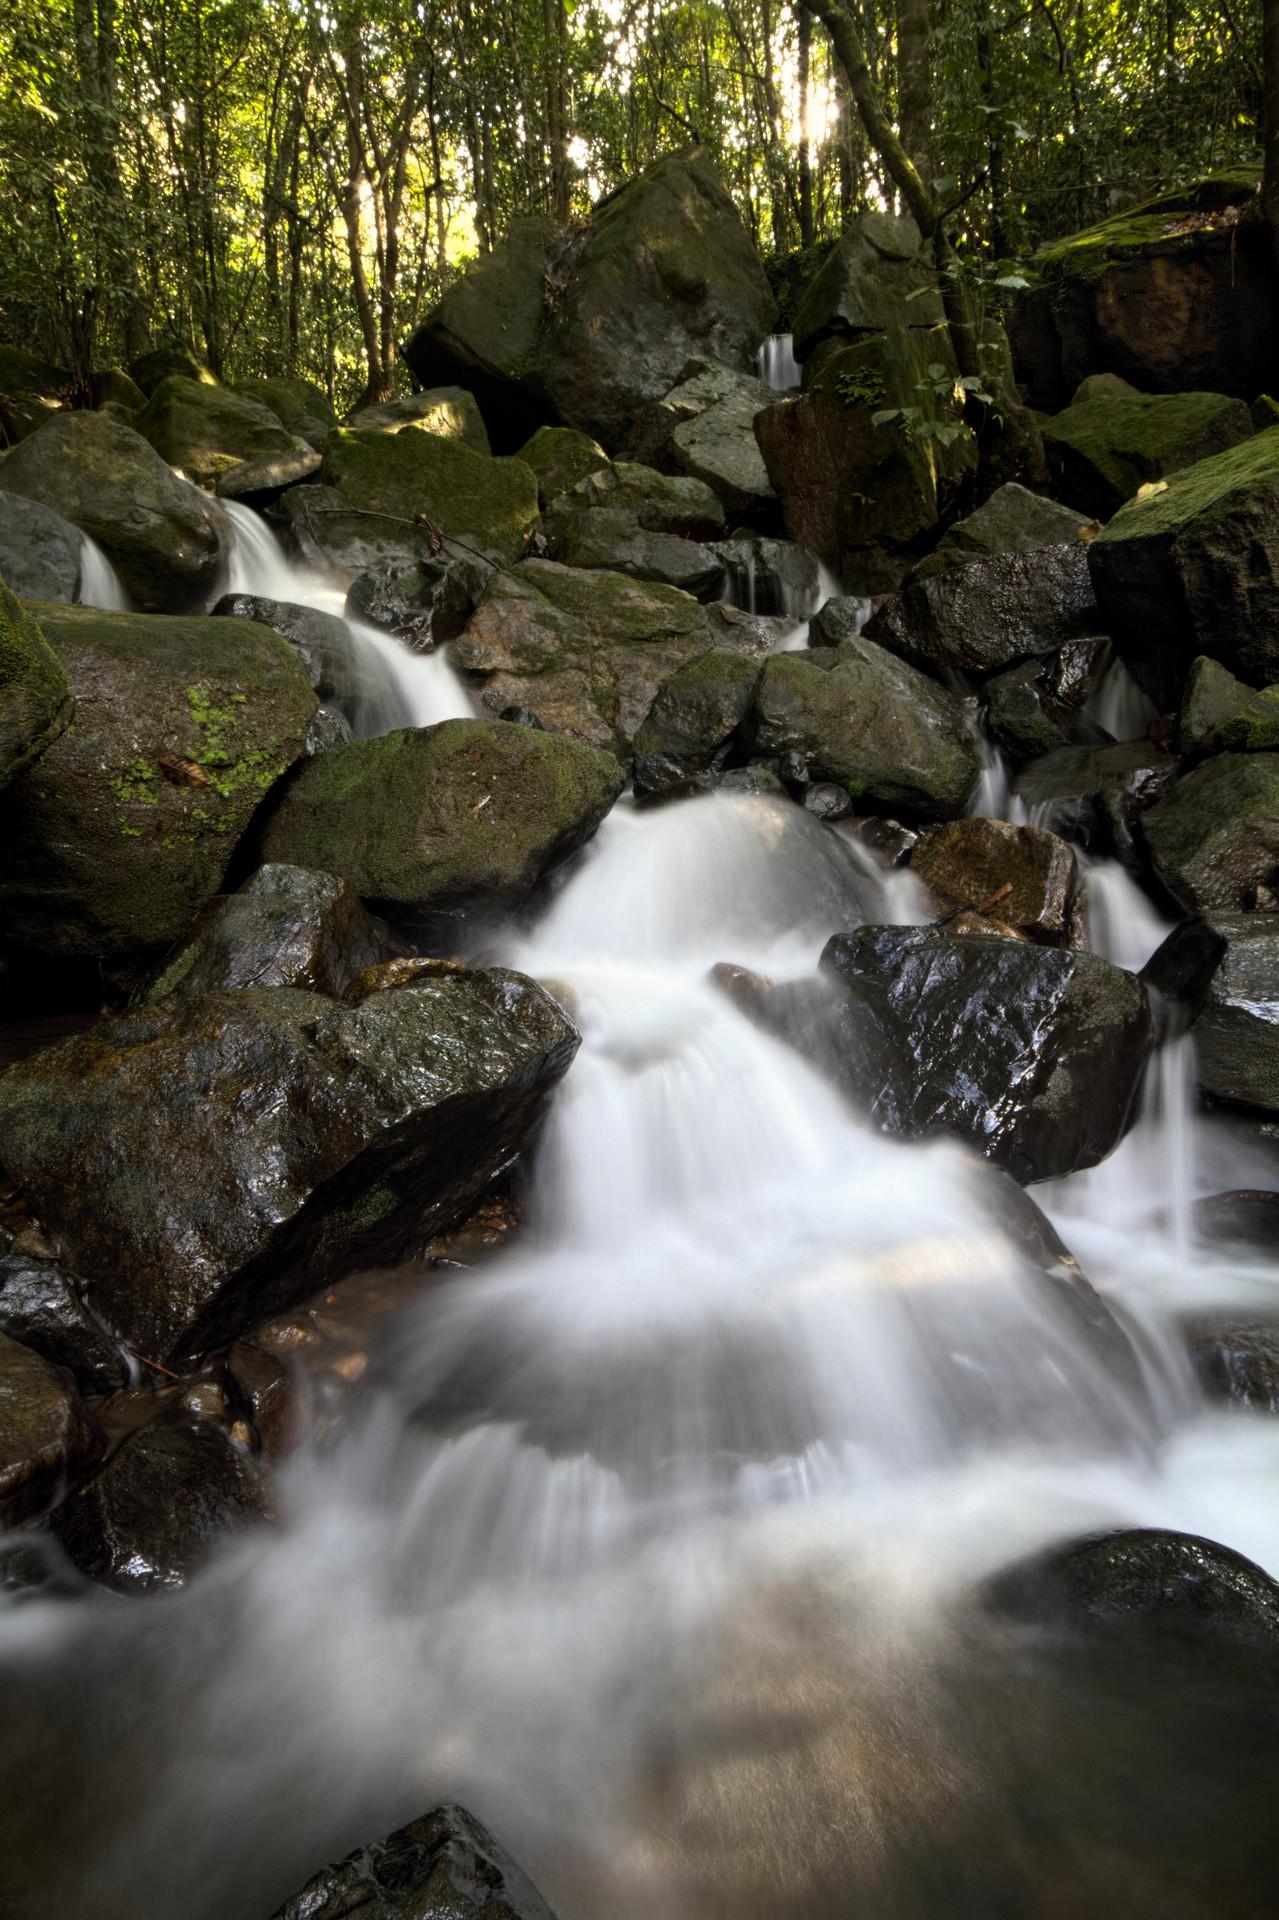 Milky Stream